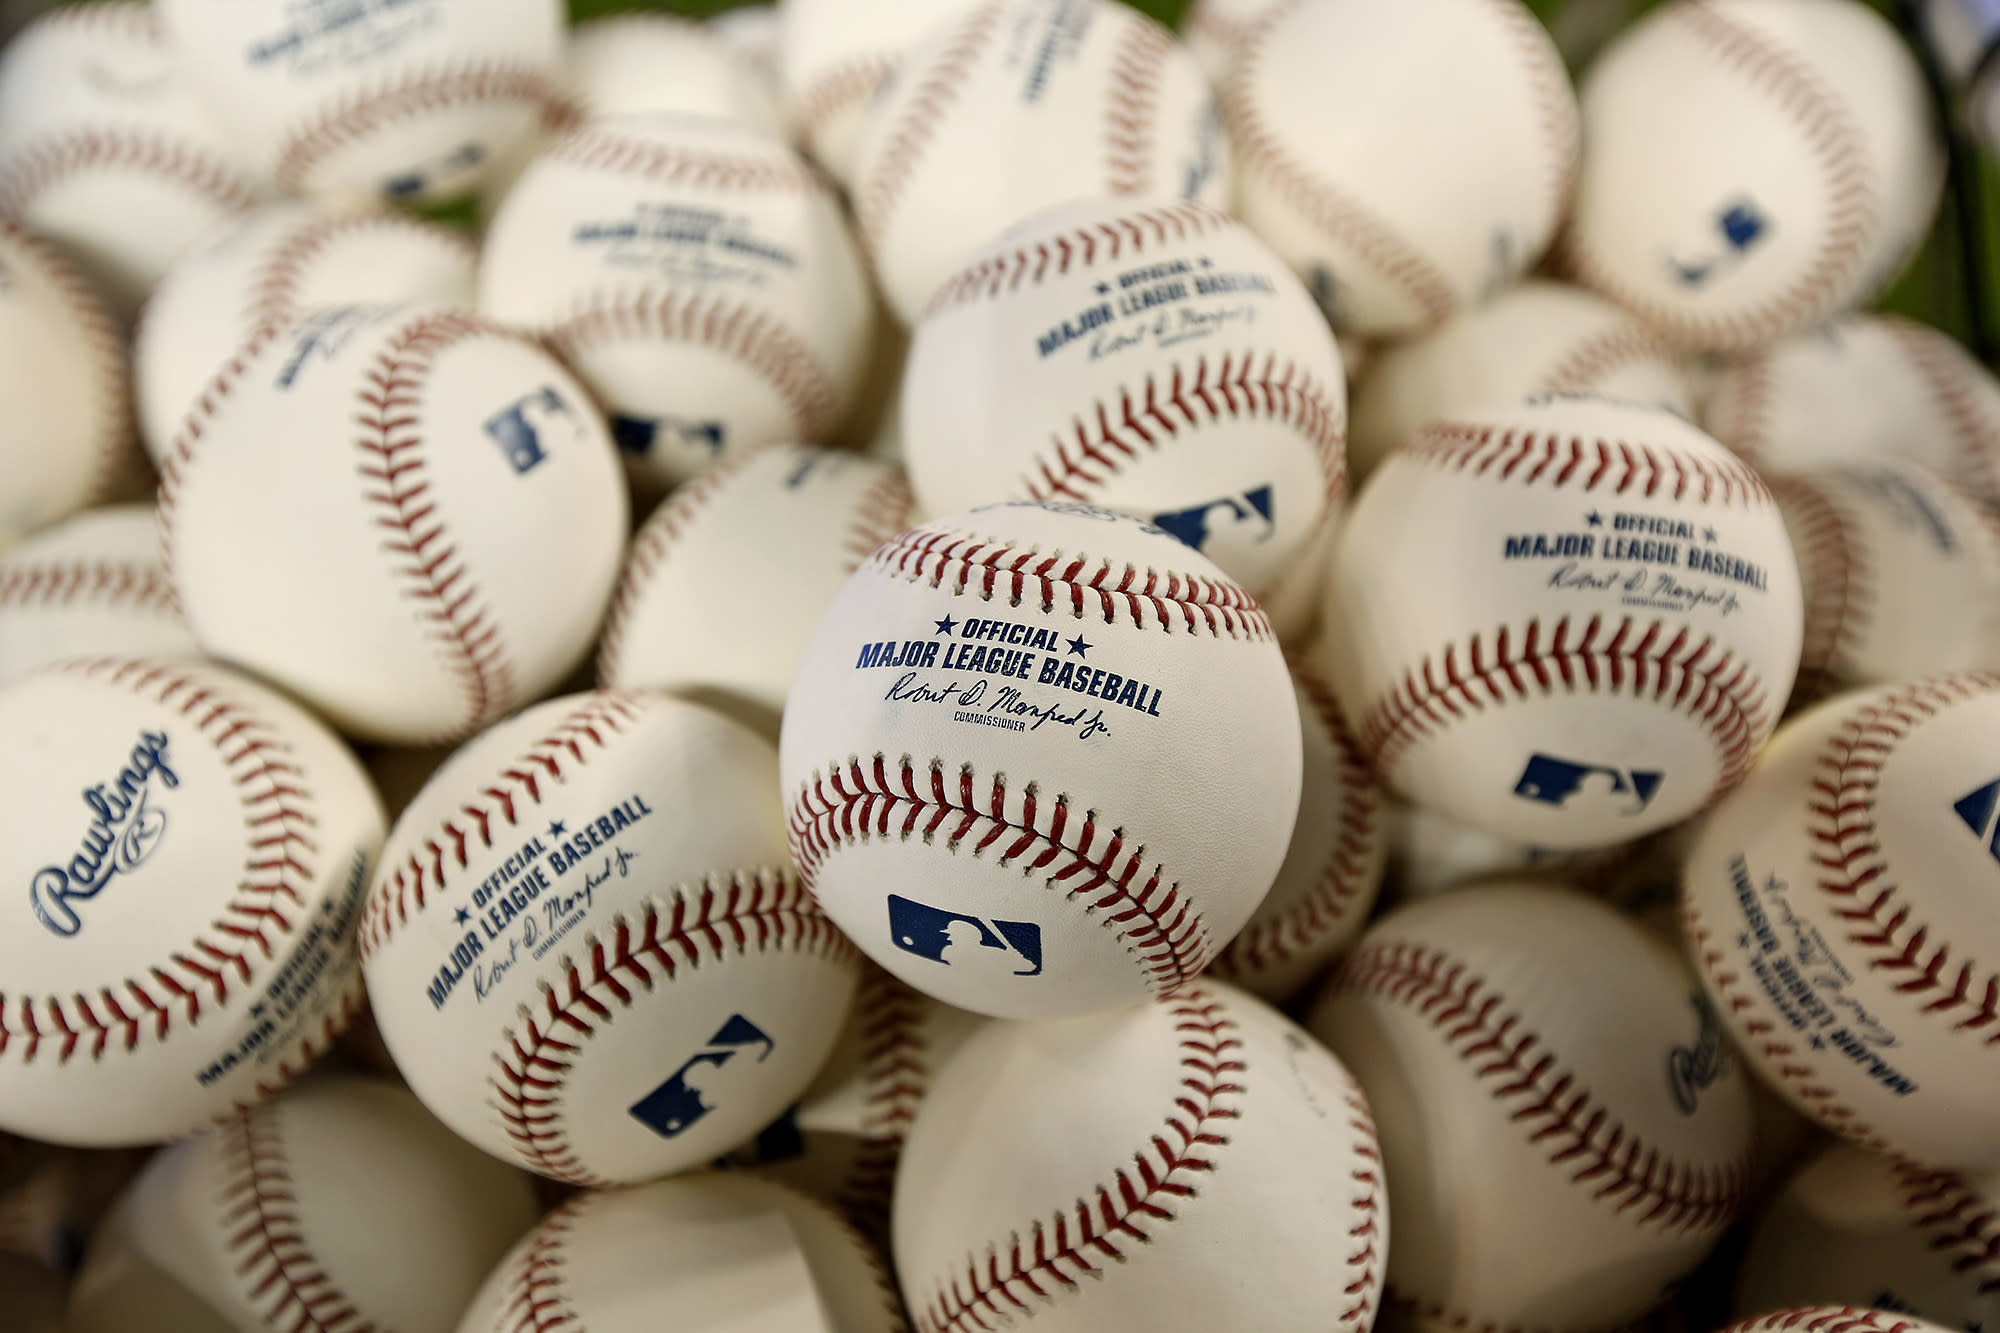 PHOTOS: MLB Opening Day 2019